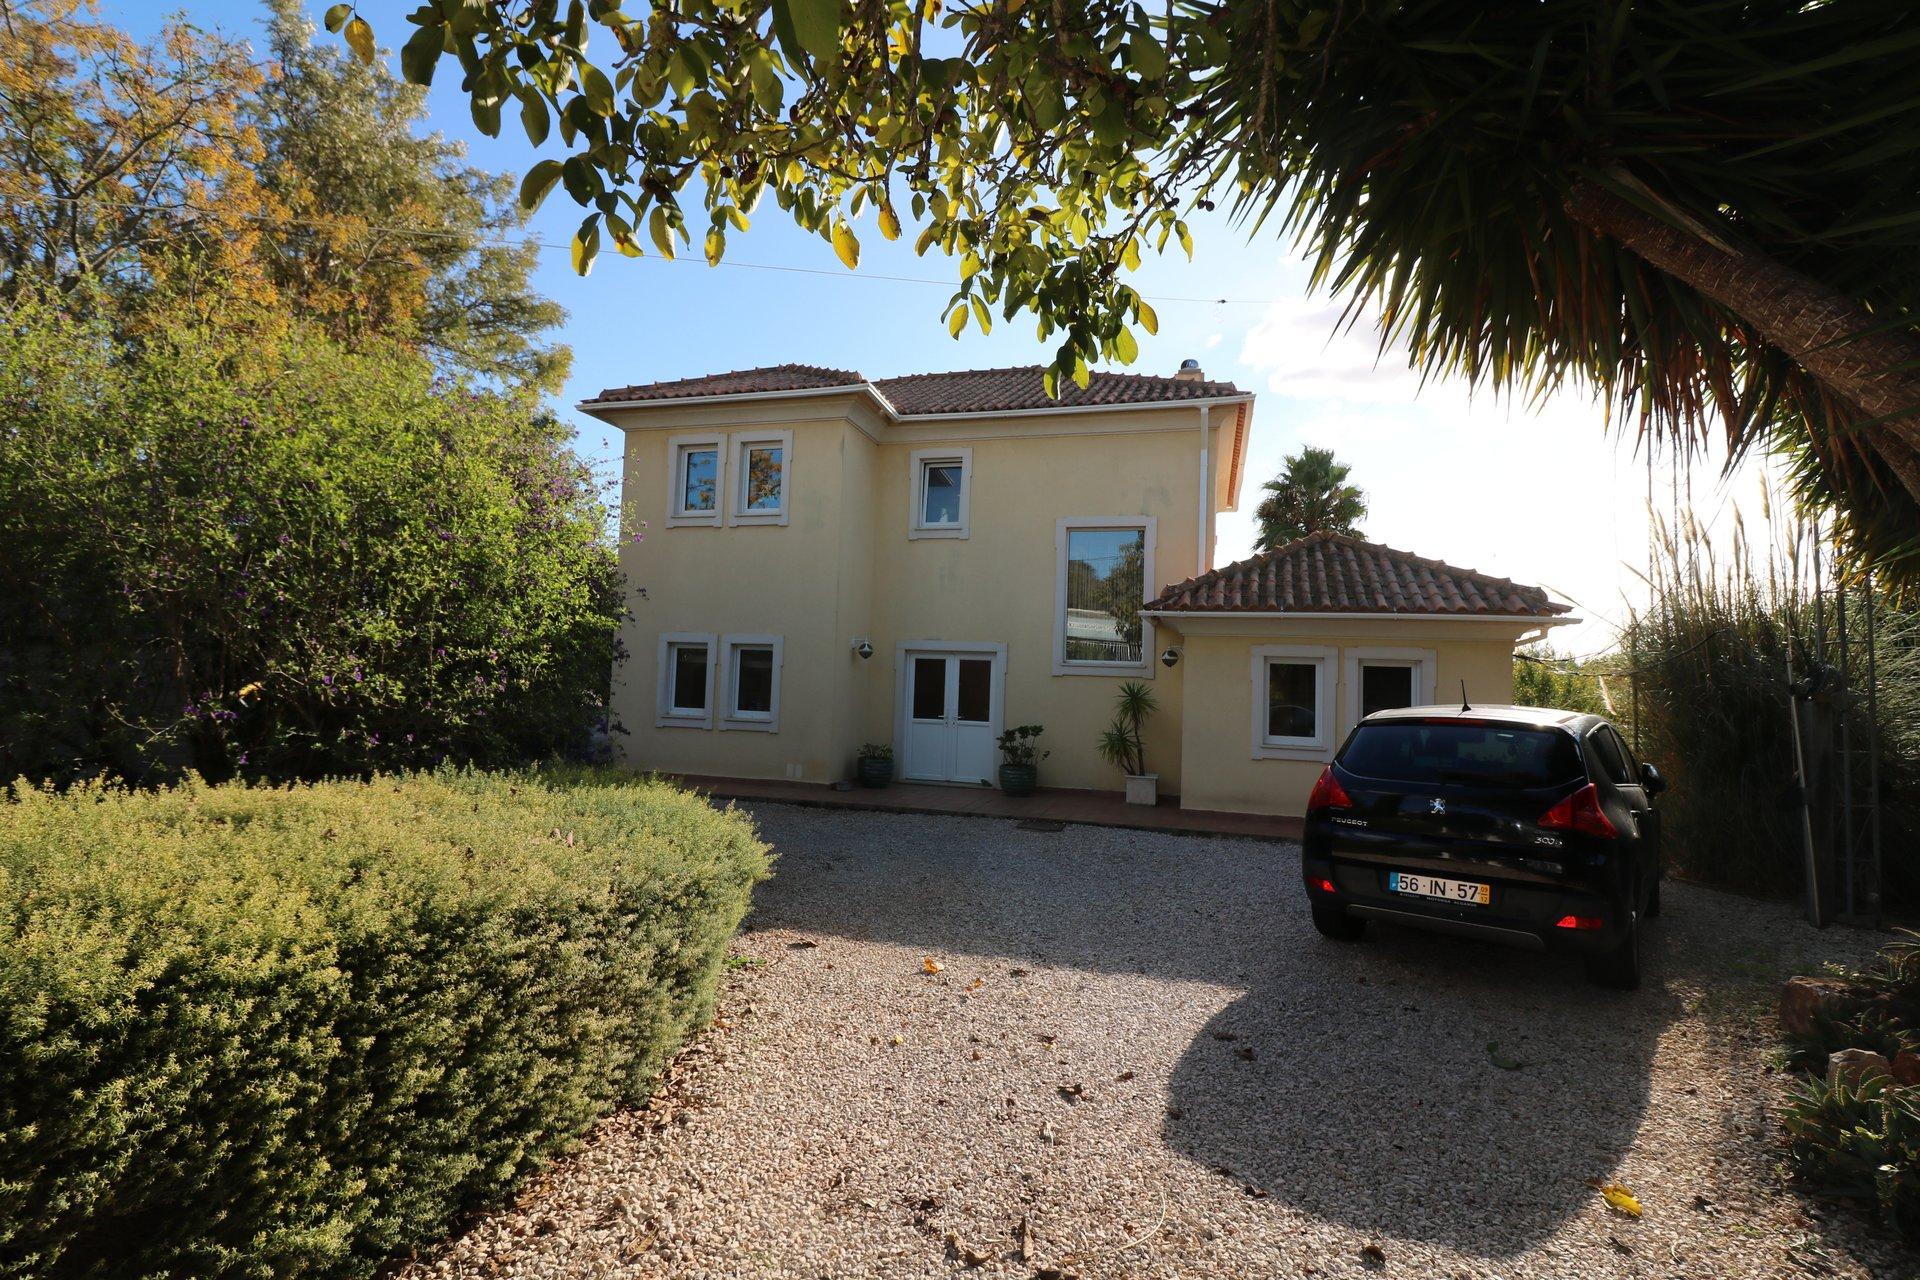 3 Bedroom Villa Sao Bartolomeu de Messines, Central Algarve Ref: JV10402